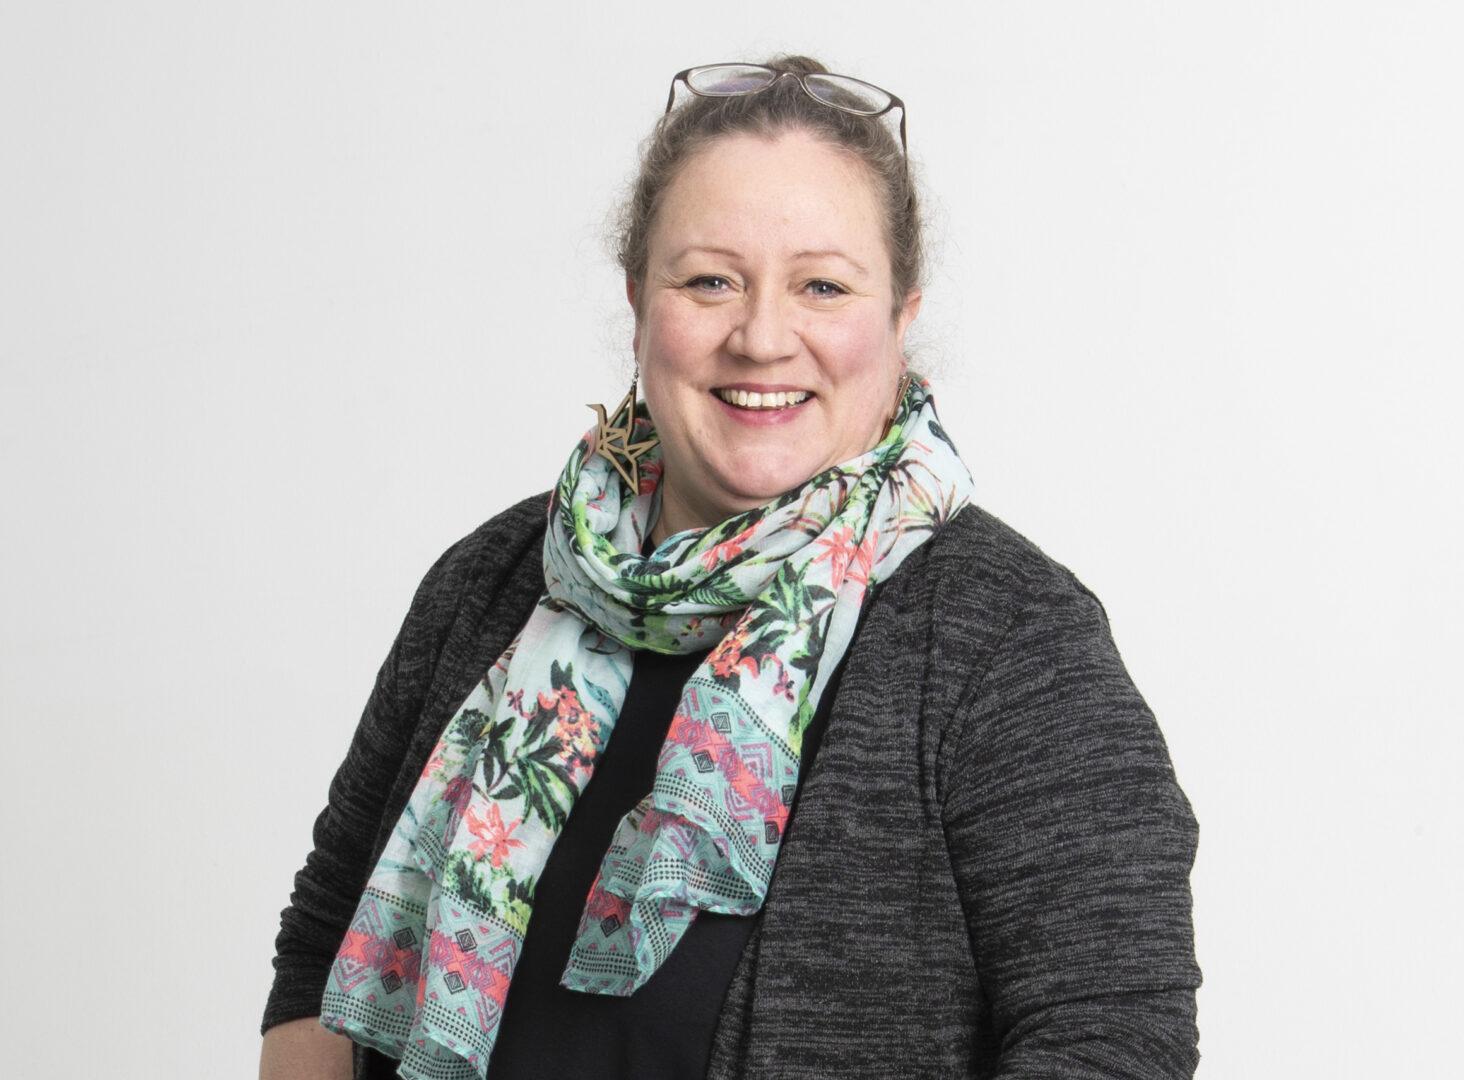 Liina Putkonen